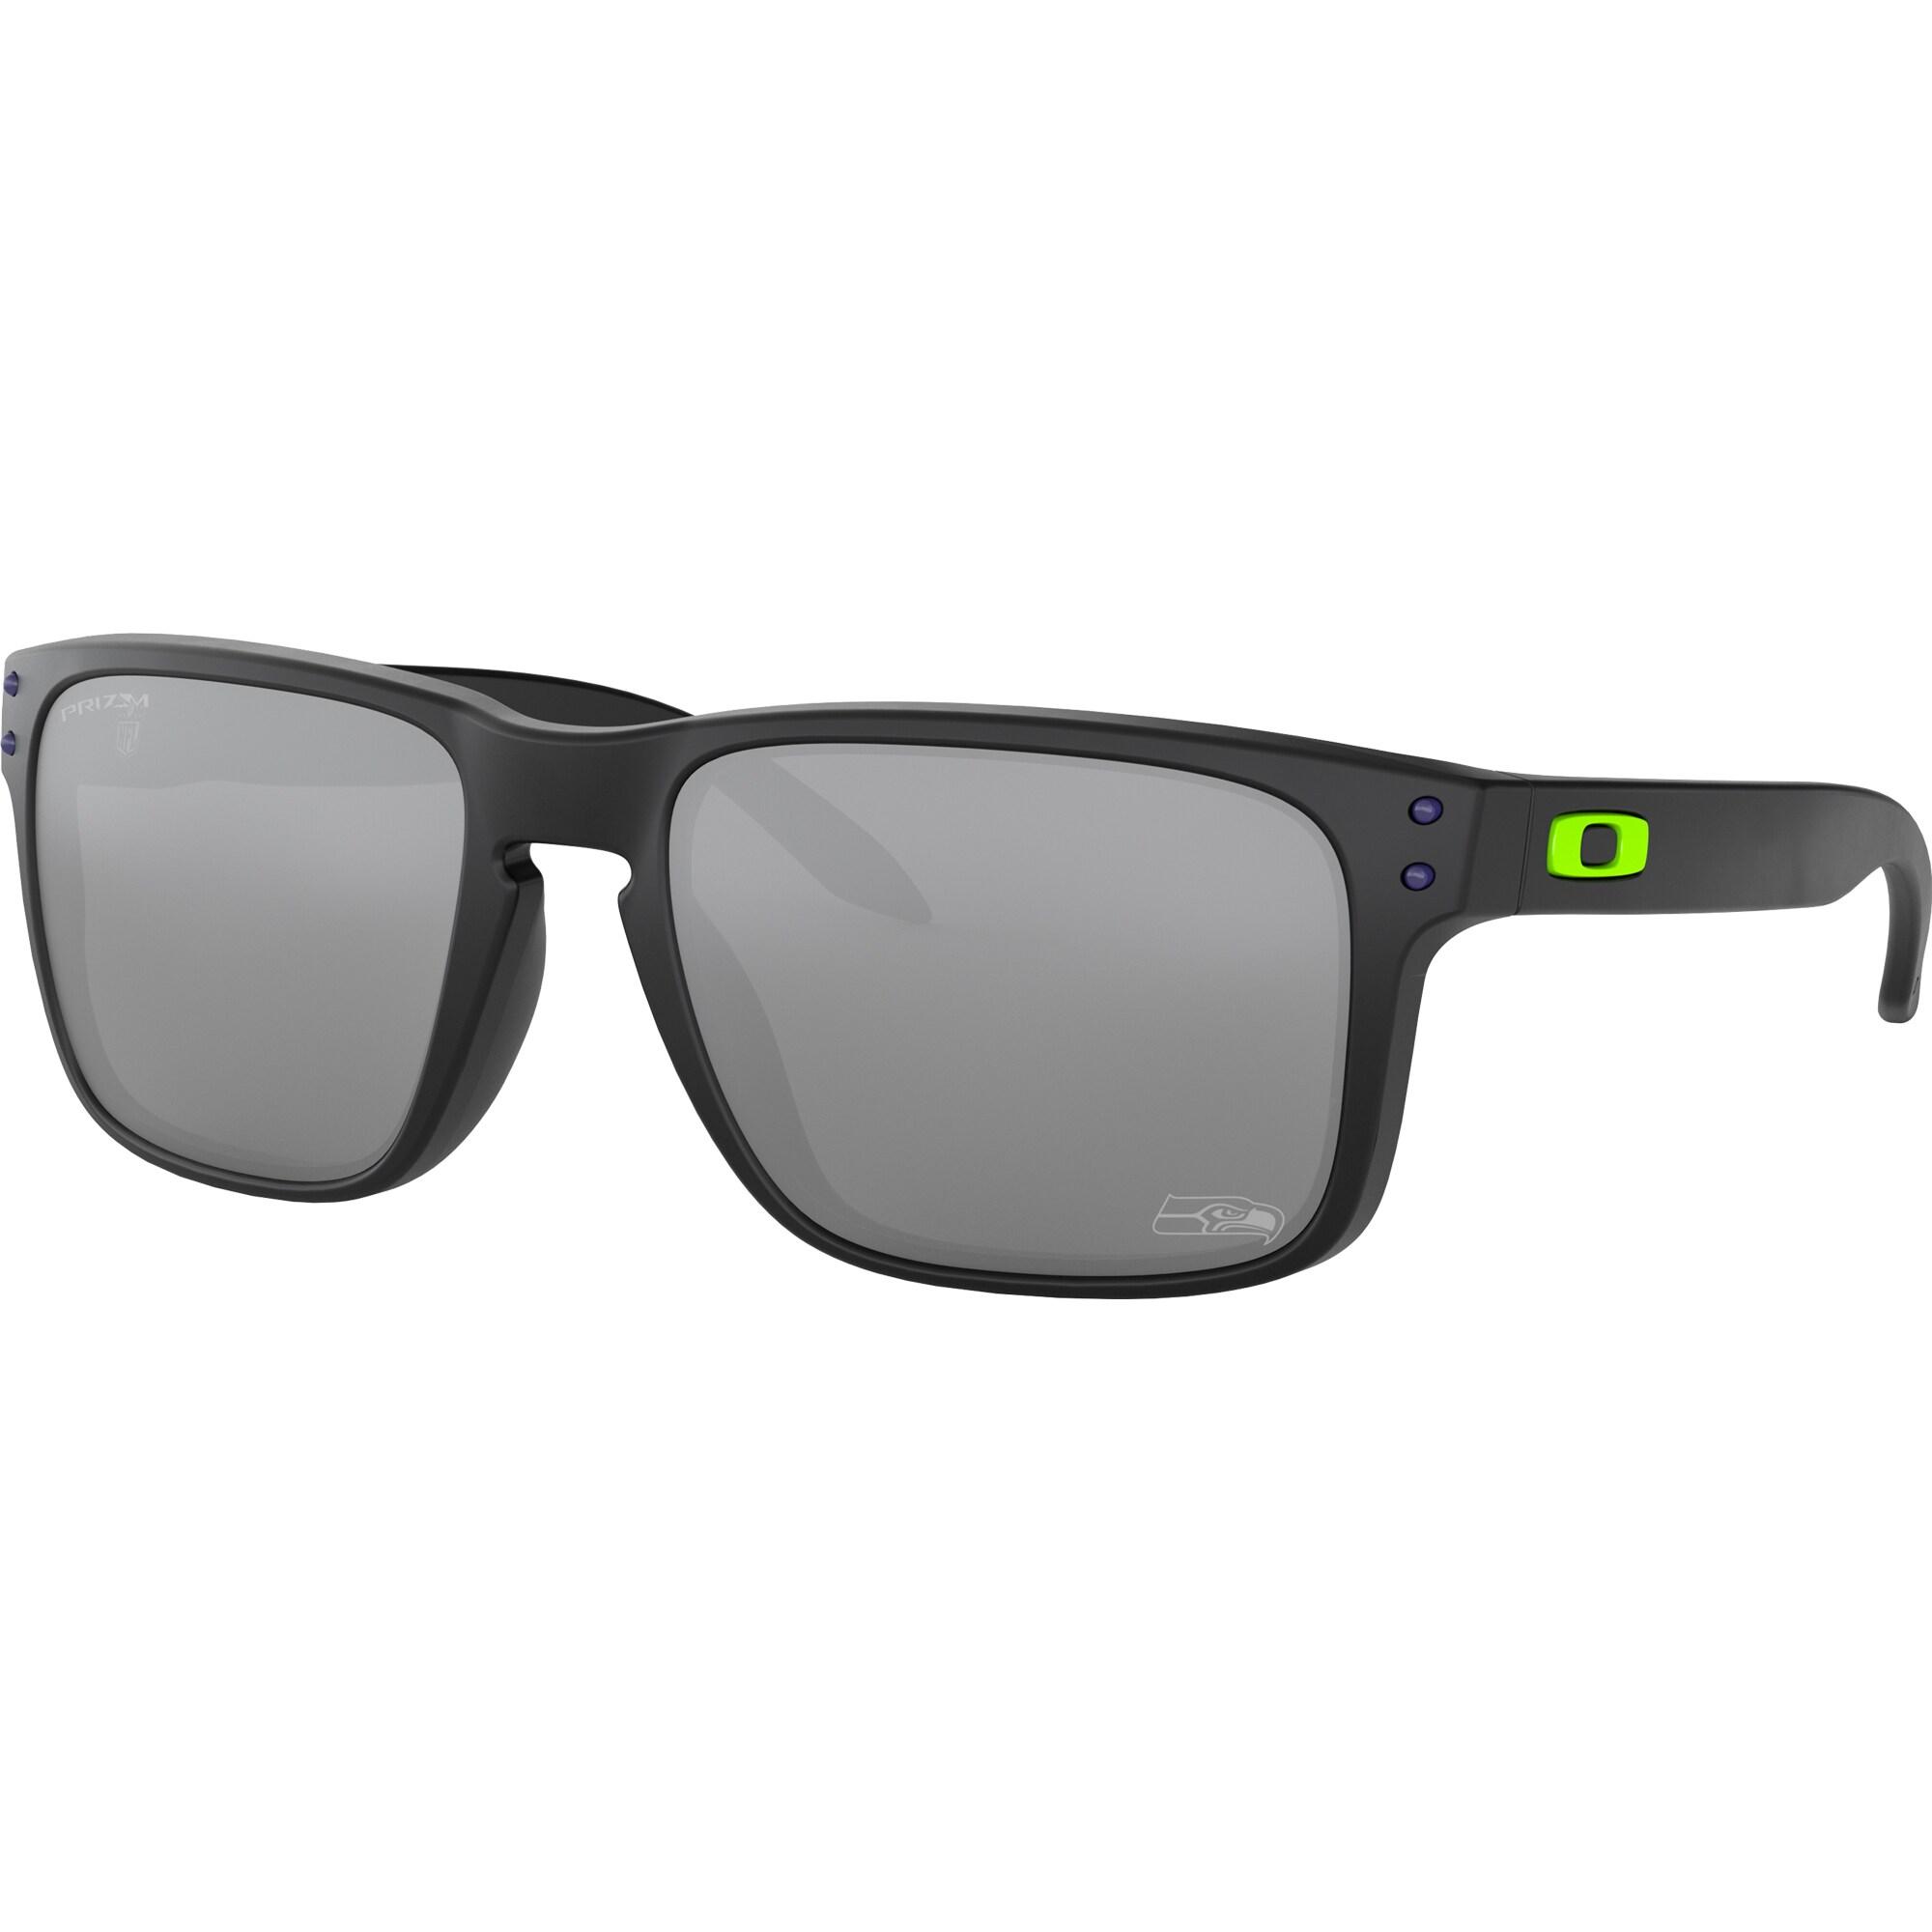 Seattle Seahawks Oakley Holbrook Sunglasses